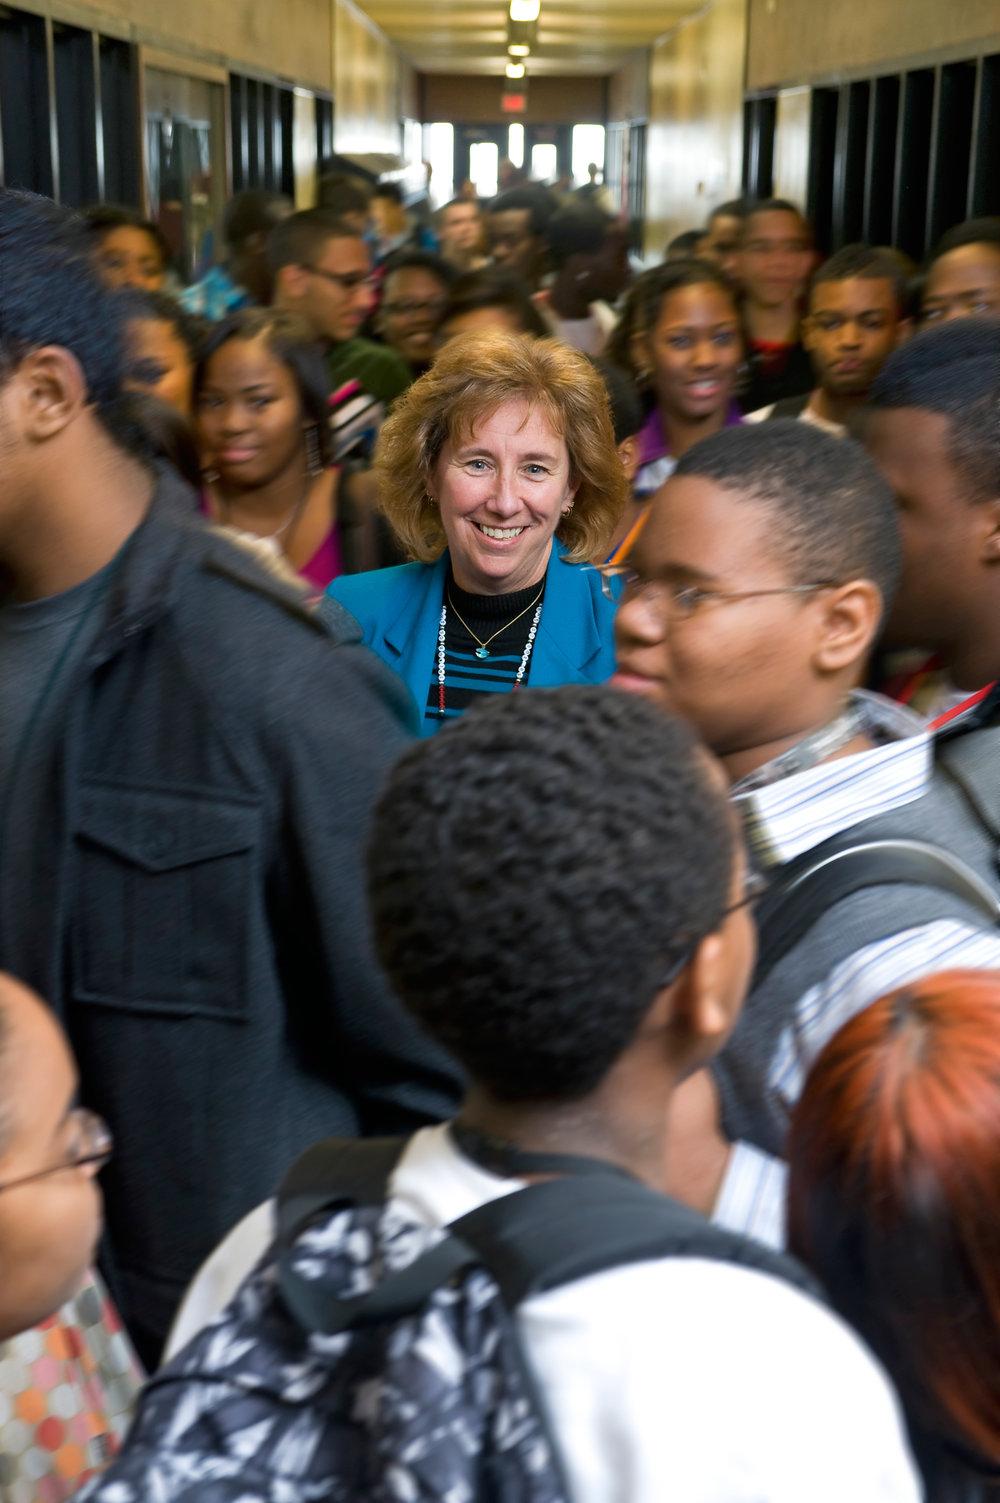 Susan Szachowicz, Principal,Brockton High School